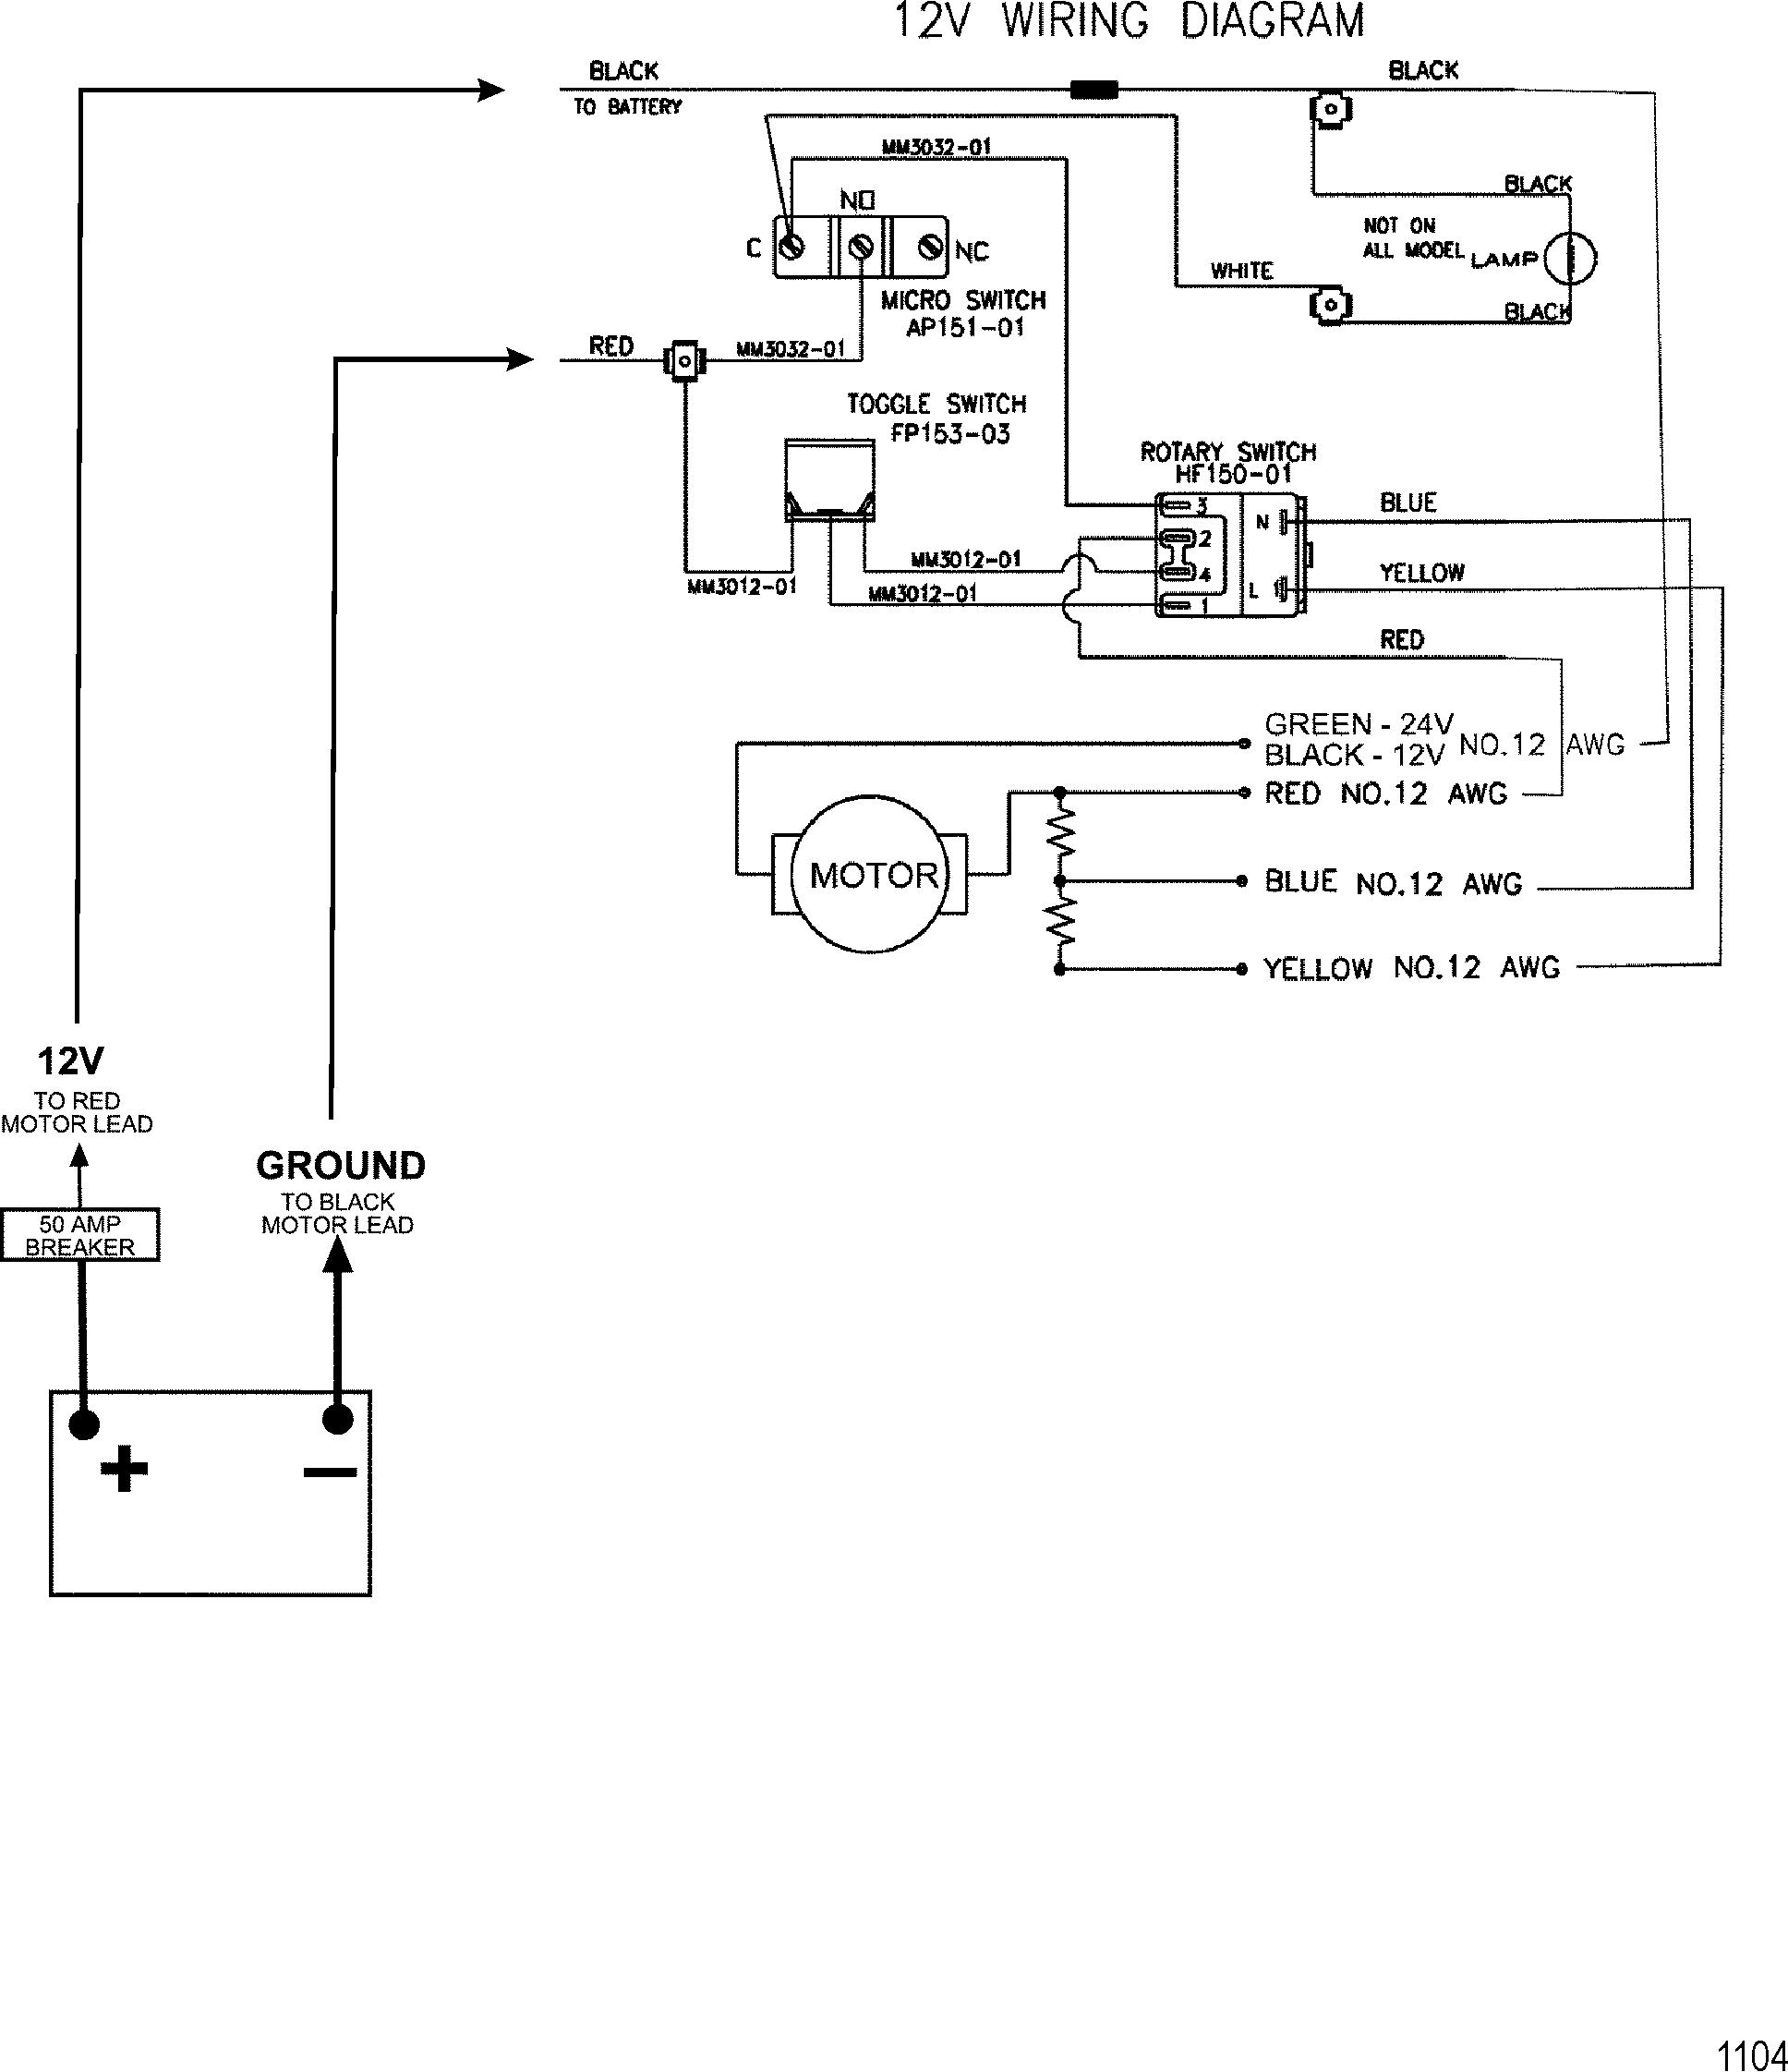 trolling motor wiring guide bc 9302  12 24 volt trolling motor wiring on 36 volt trolling  trolling motor wiring on 36 volt